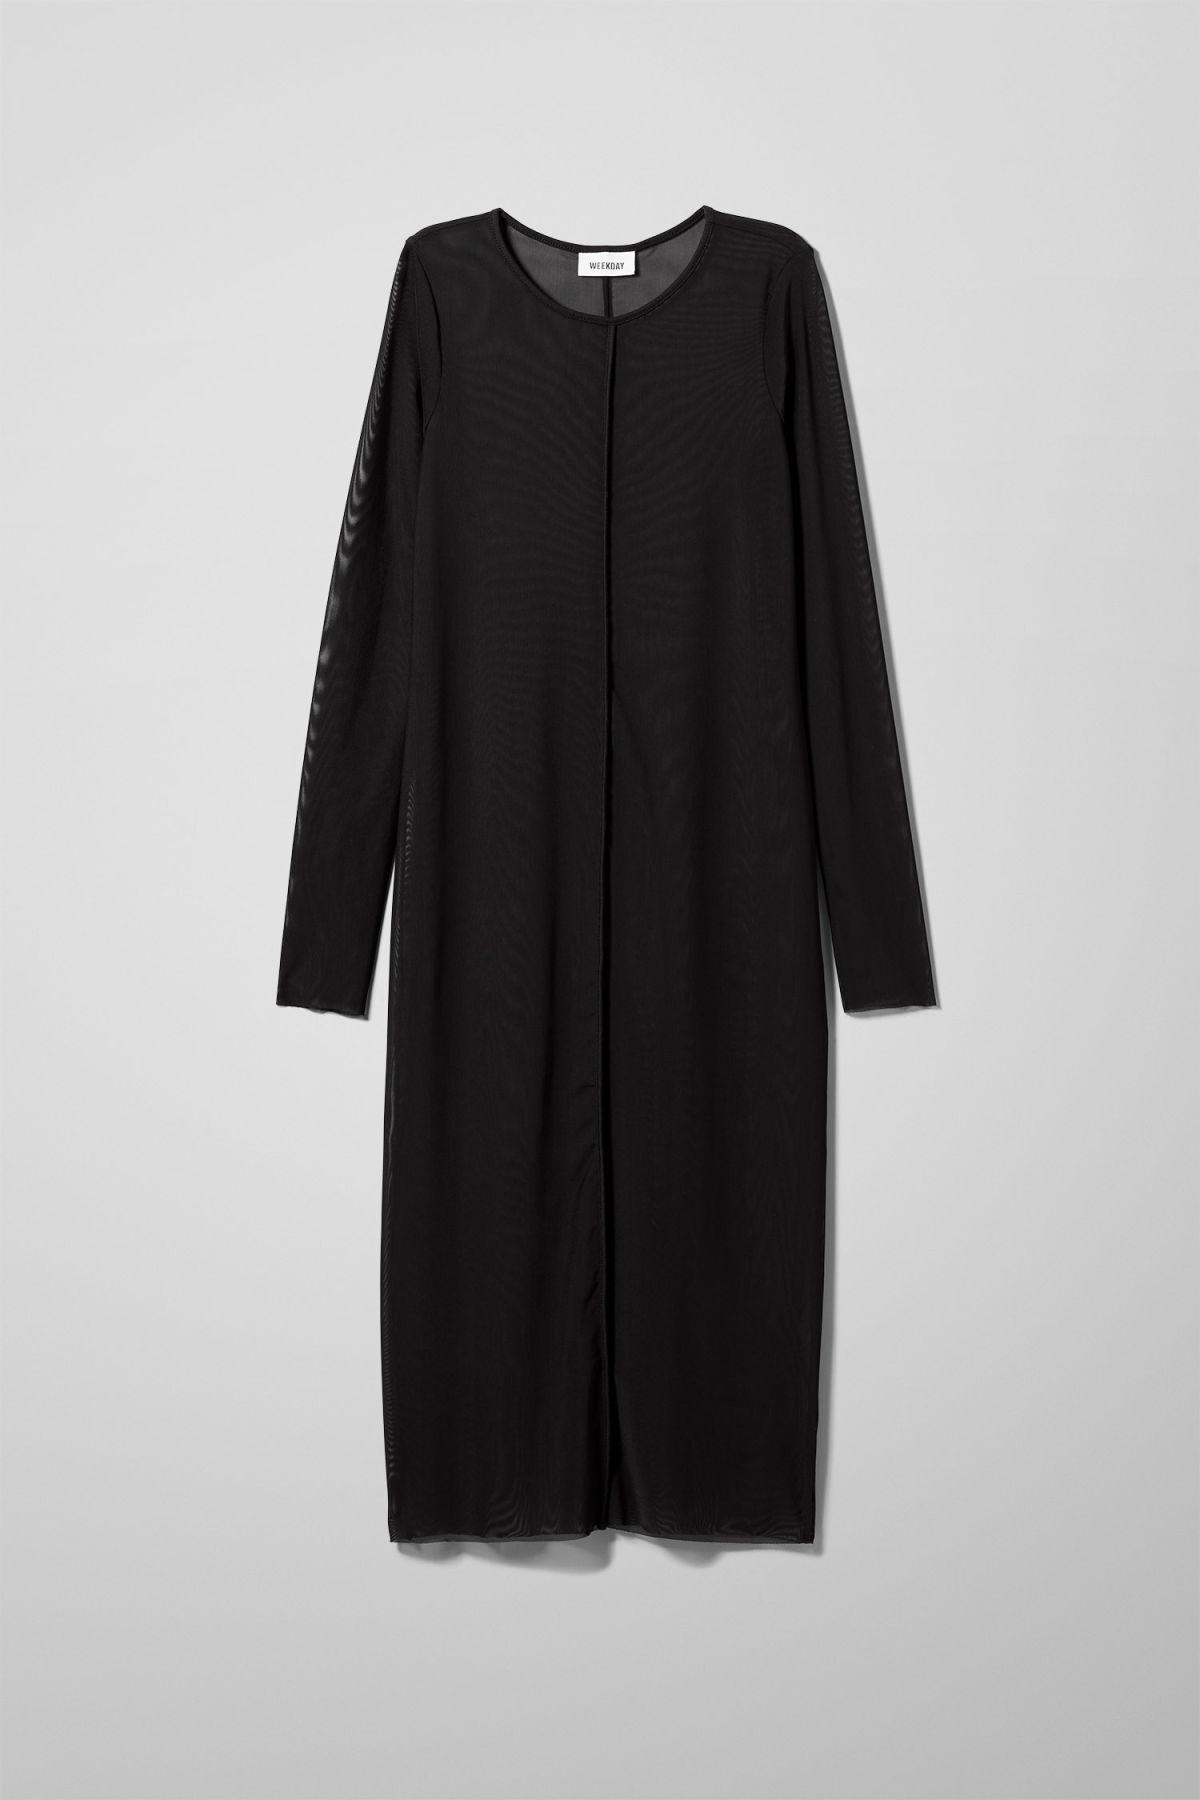 Image of Emelie Mesh Dress - Black-M